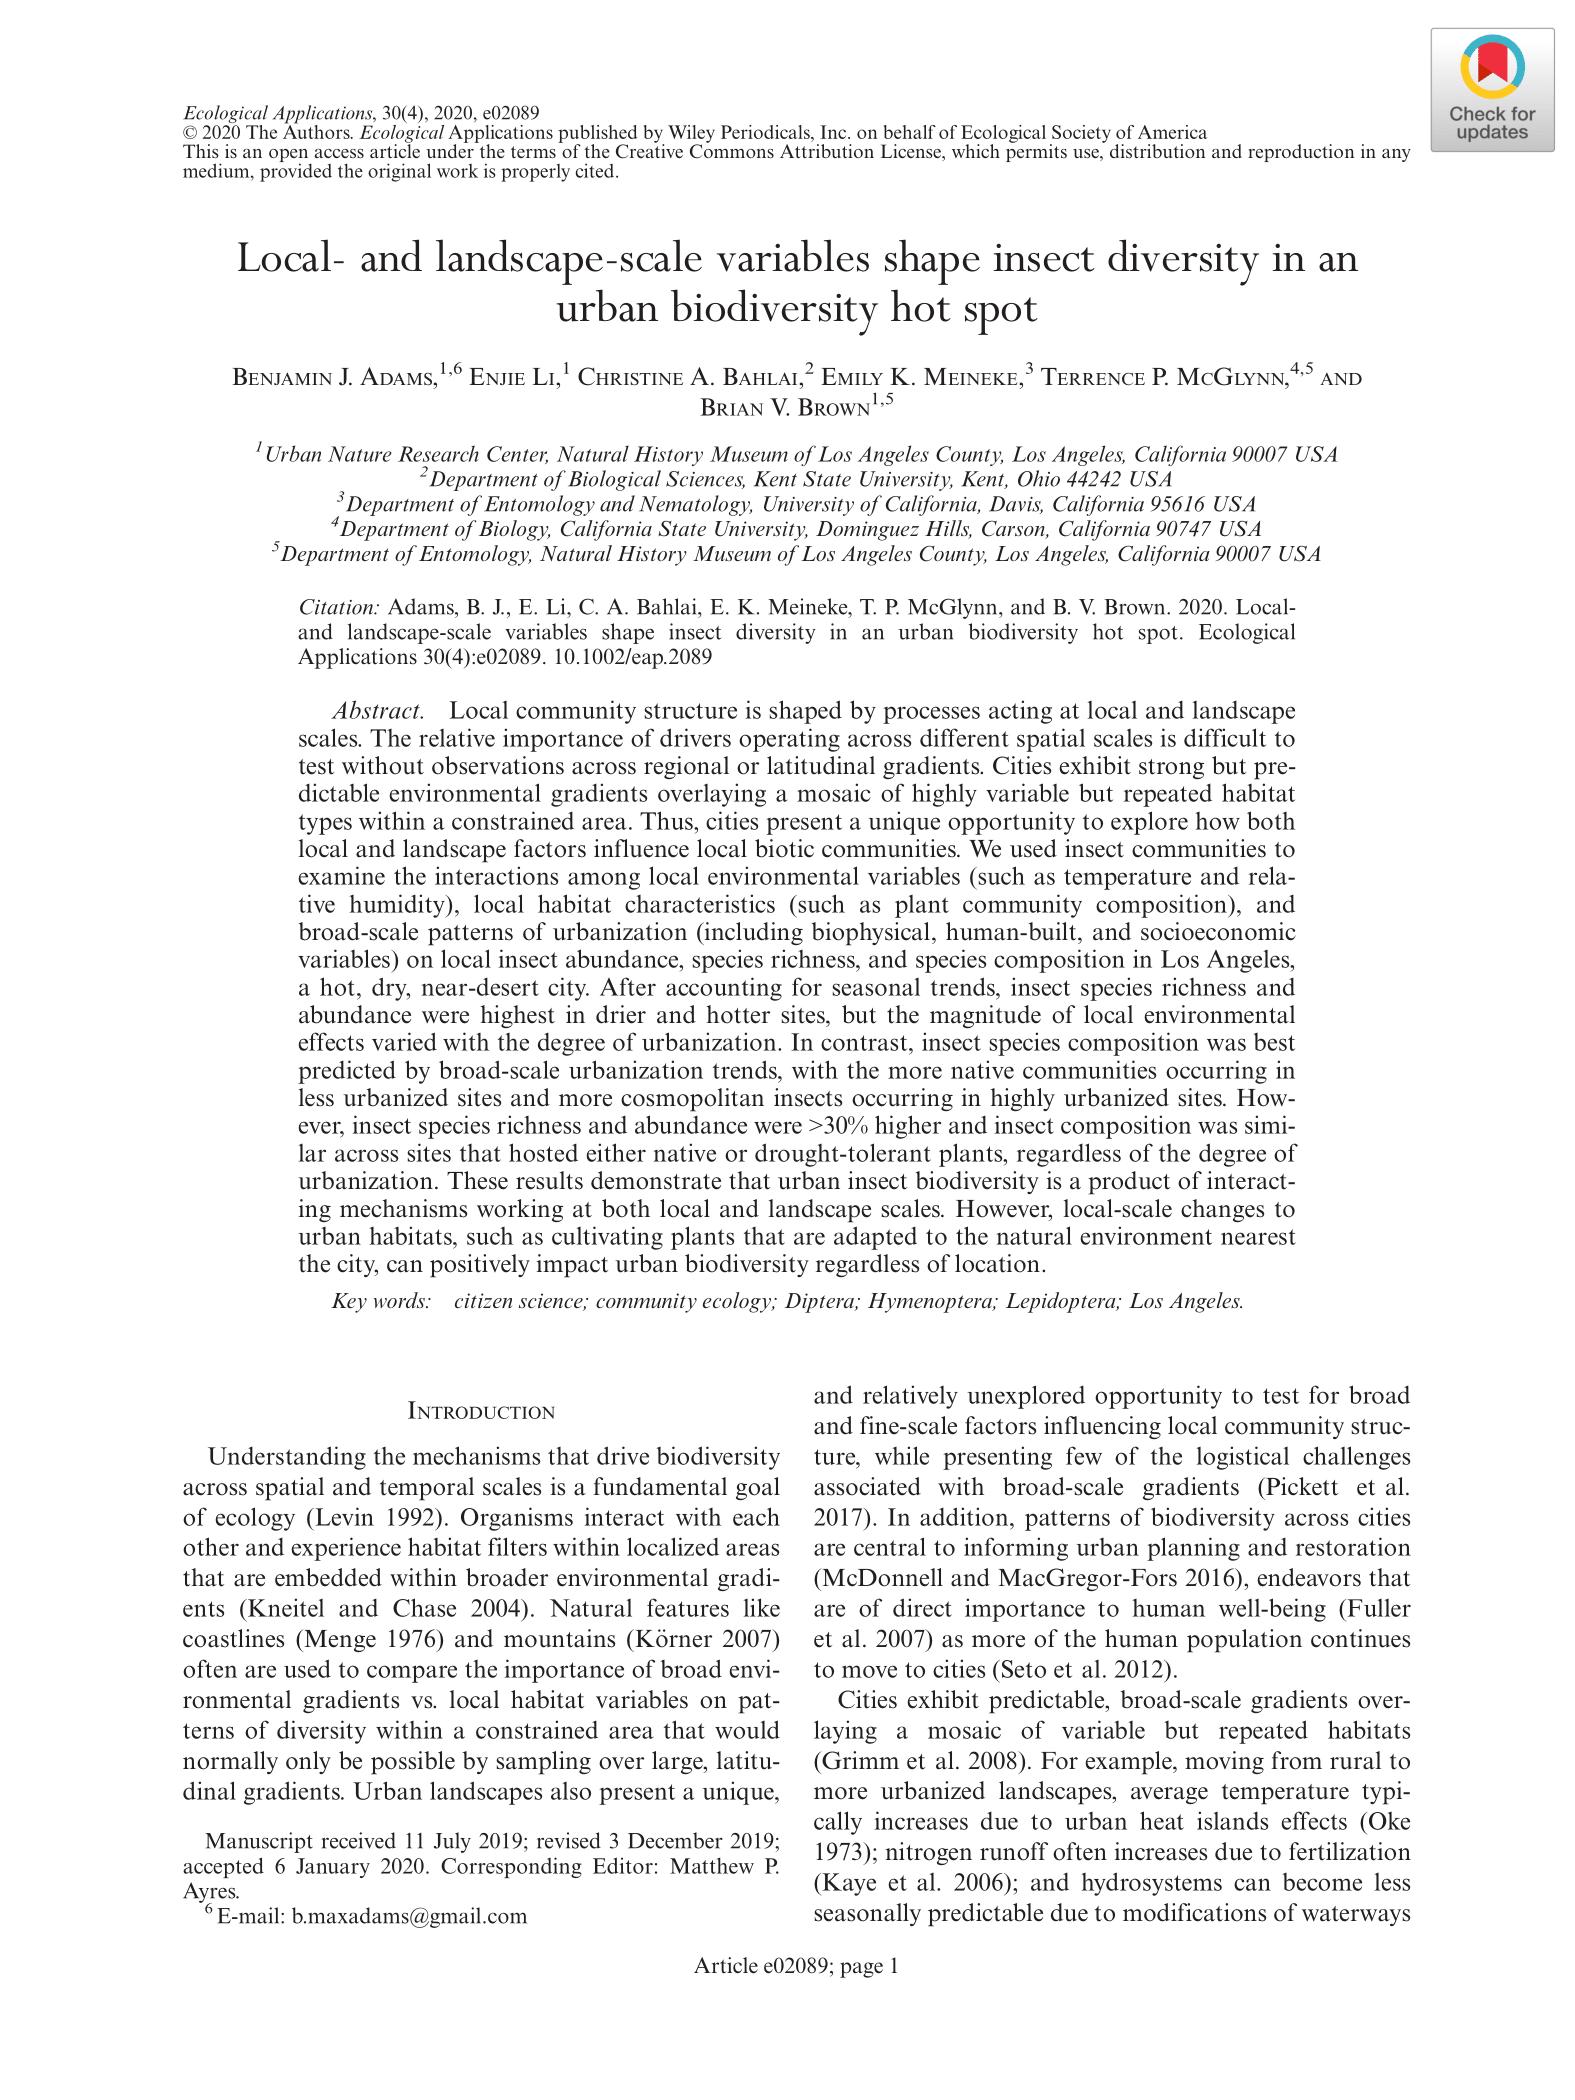 First page of Adams et al.